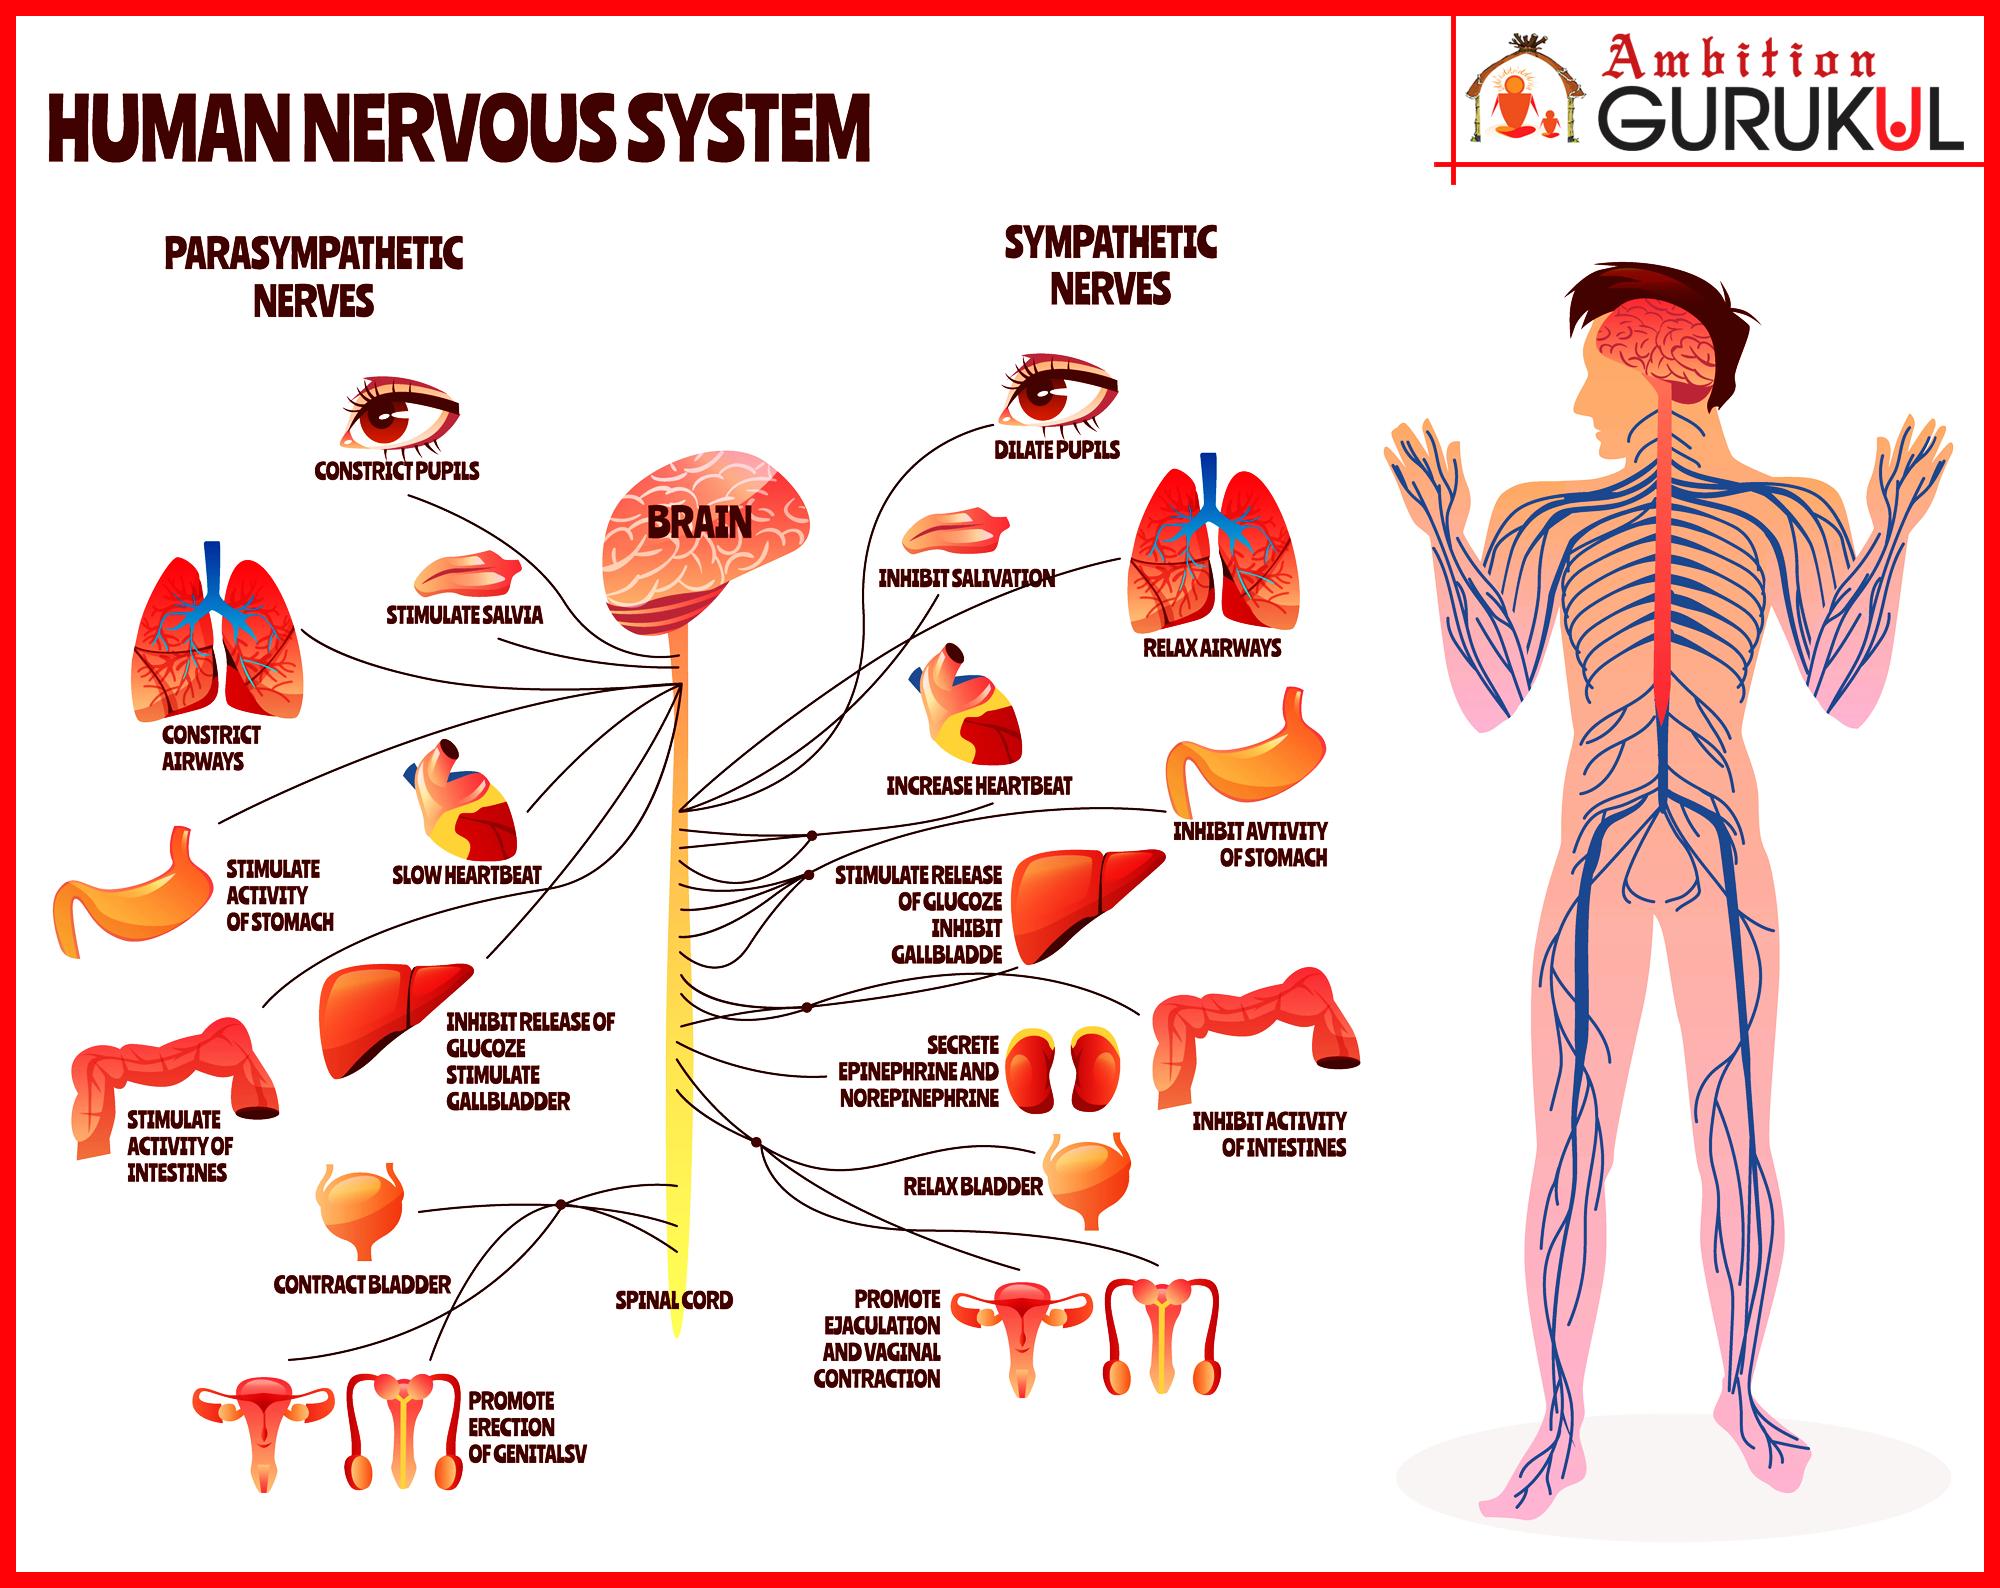 Human Nervous System Human Nervous System Nervous System Cartoon Design